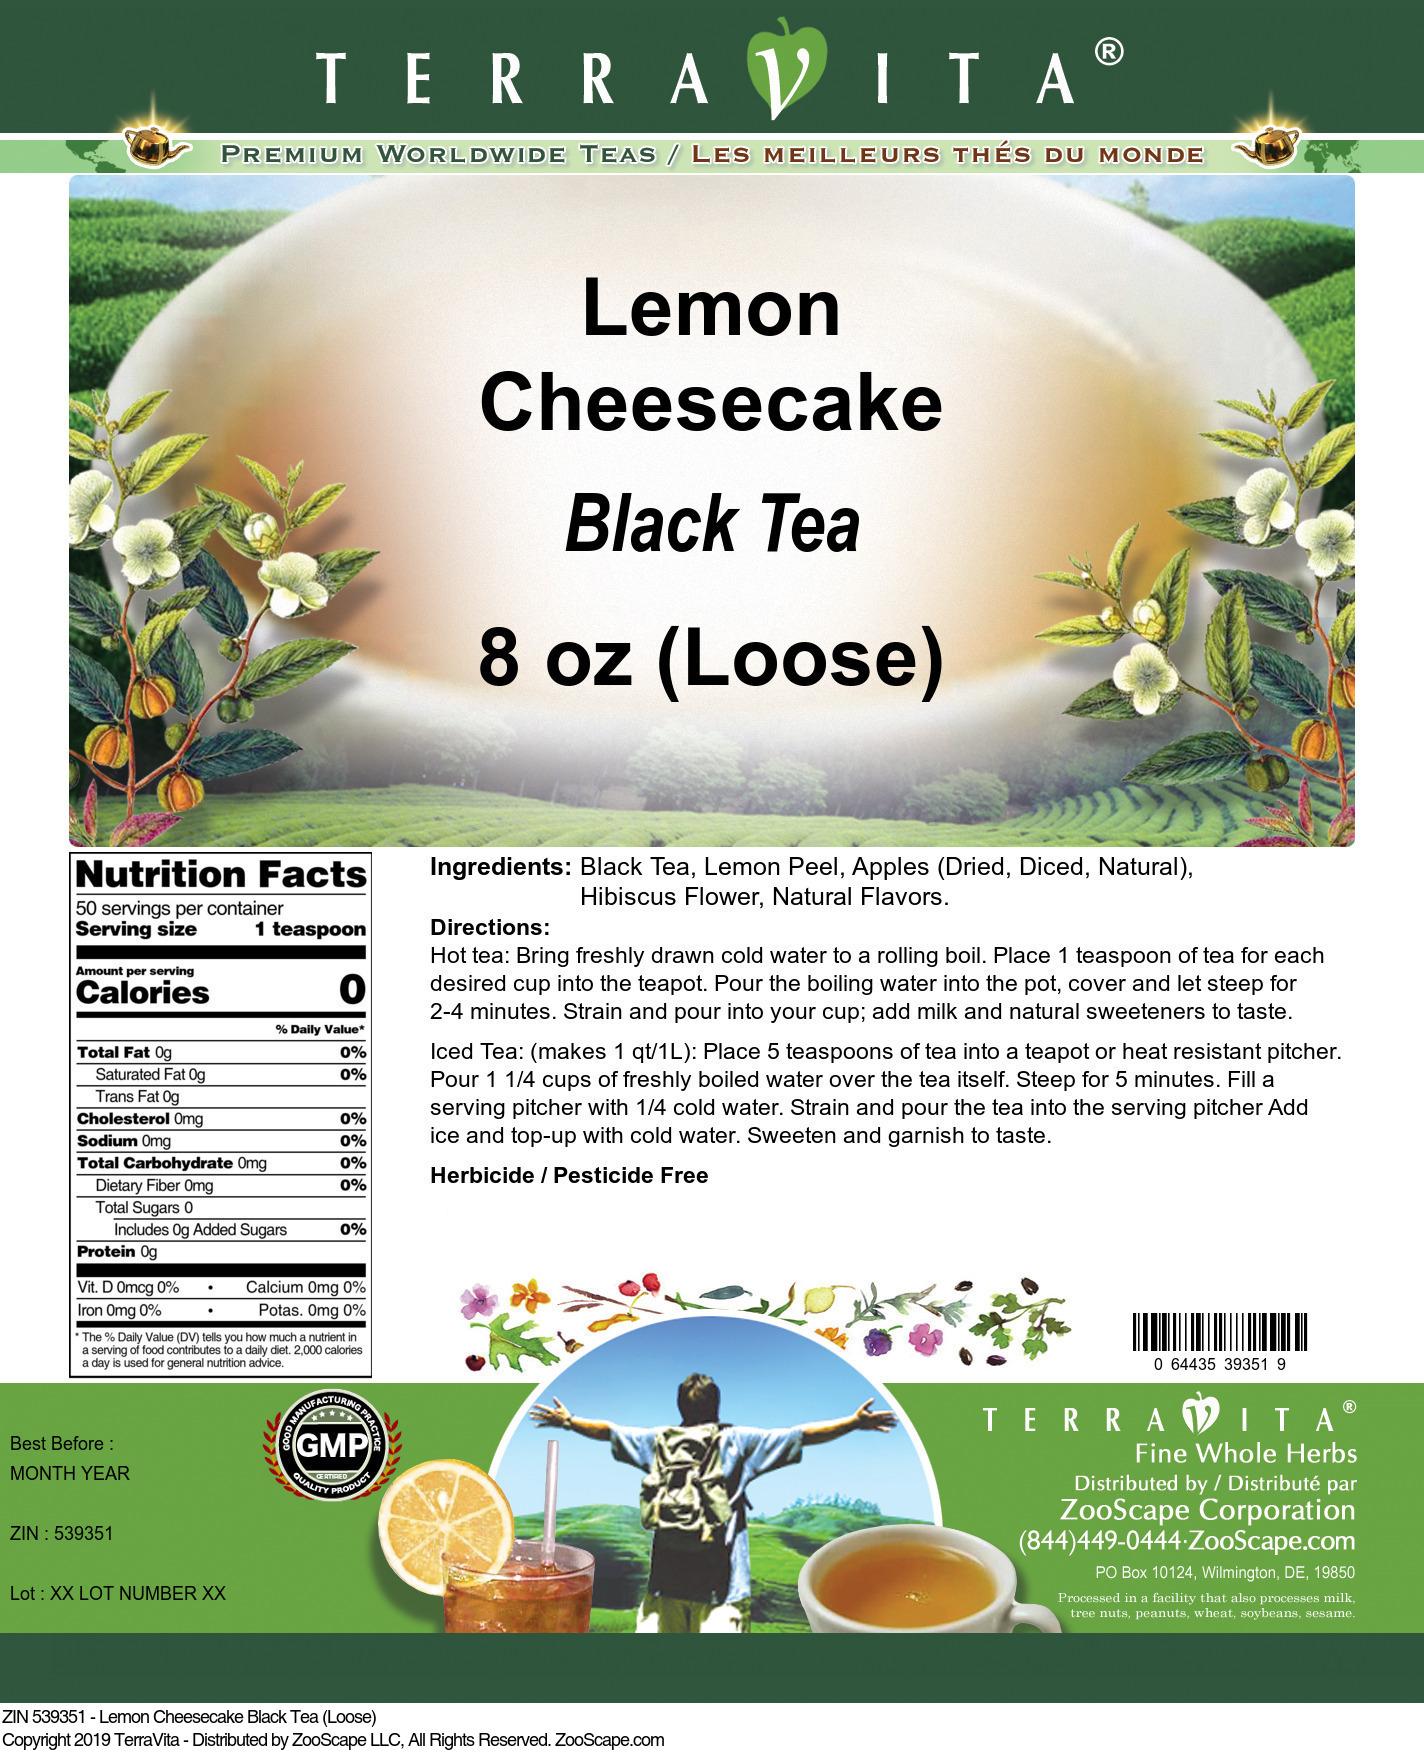 Lemon Cheesecake Black Tea (Loose)